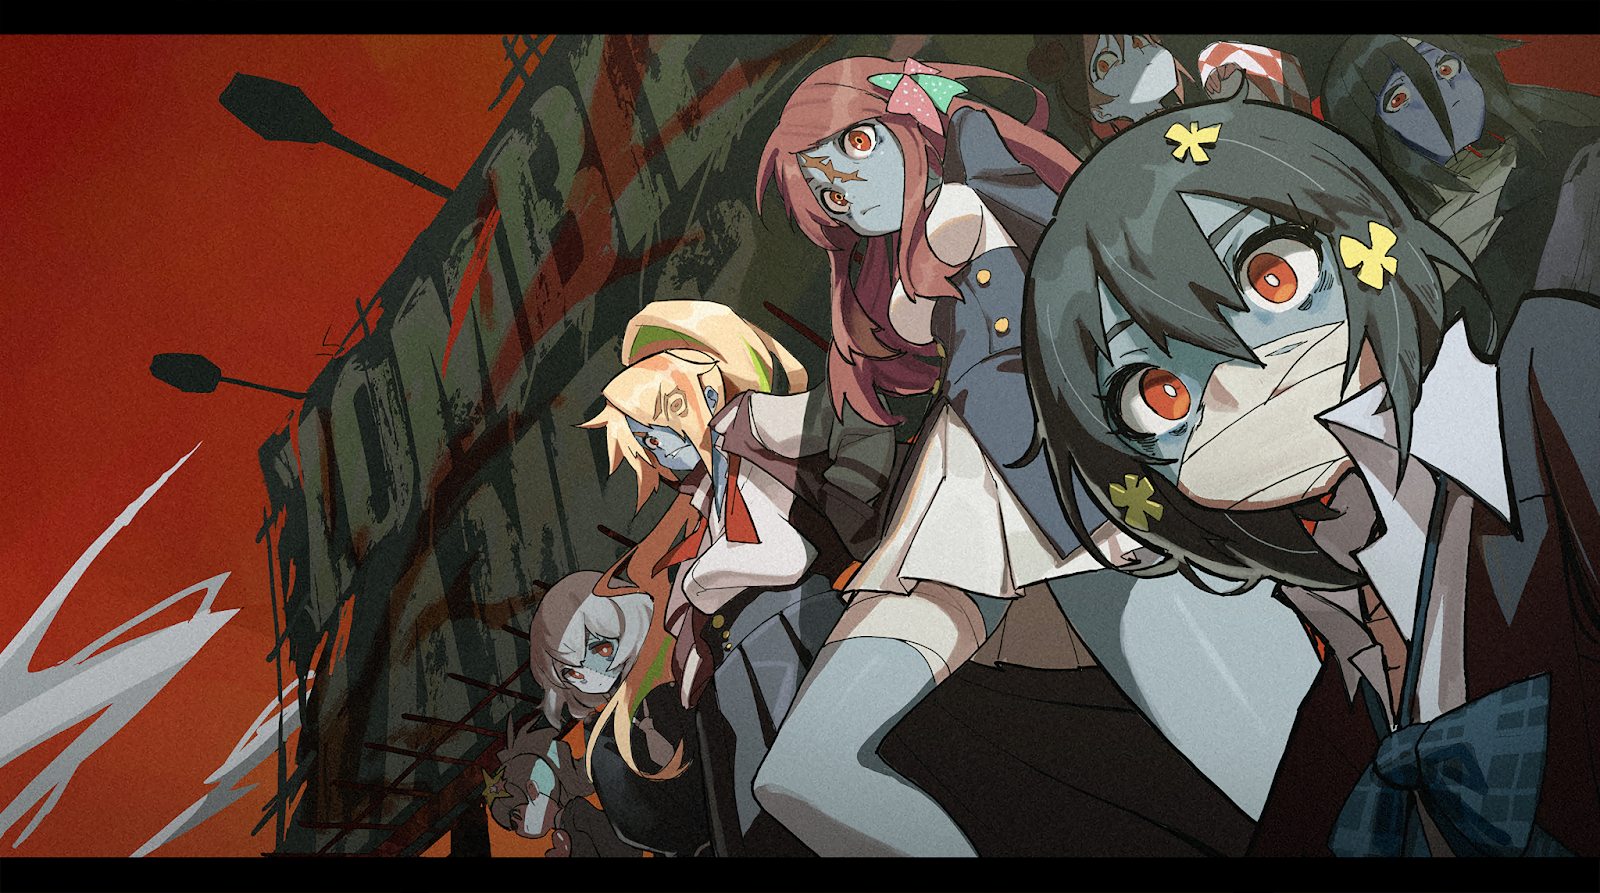 Zombie Land Saga Wallpapers Hd Zombie Land Saga Anime Zombie Zombieland